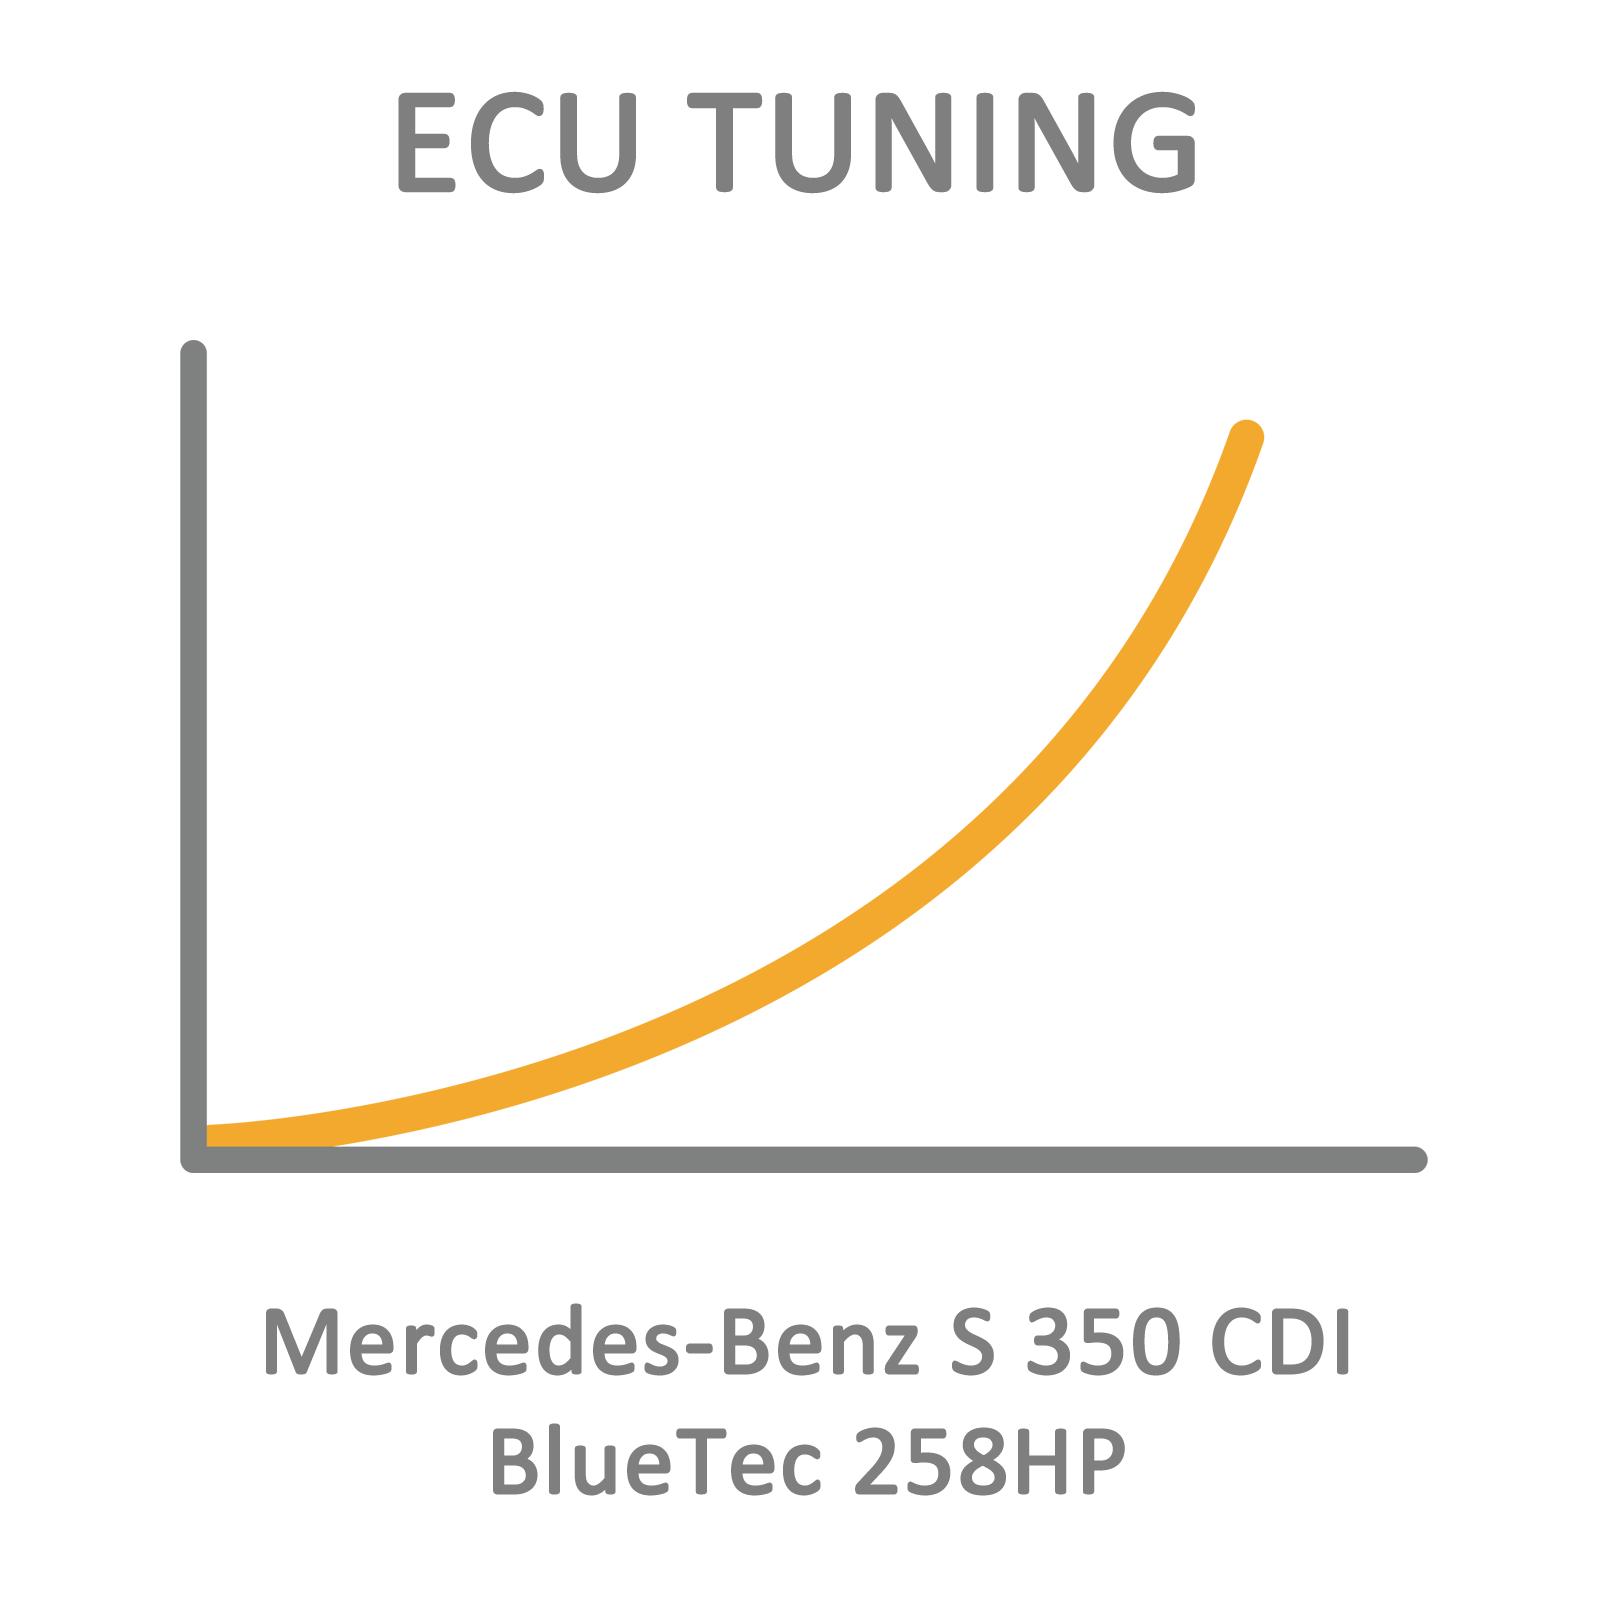 Mercedes-Benz S 350 CDI BlueTec 258HP ECU Tuning Remapping